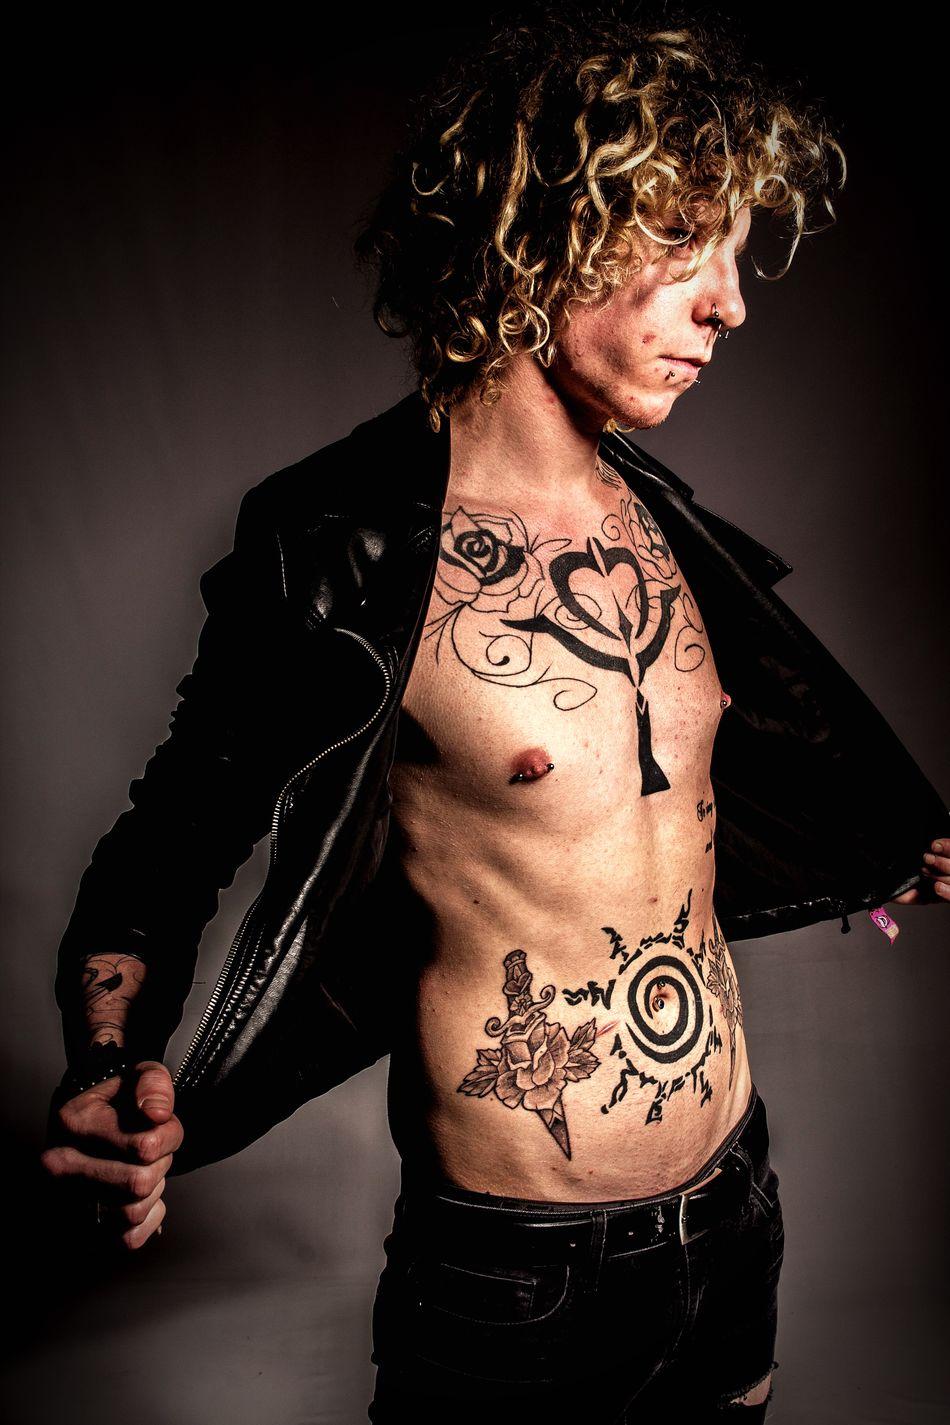 Tattoo Human Body Part Fashion Blond Hair Adult Portrait Indoors  Black Background Photographer Wolverhampton